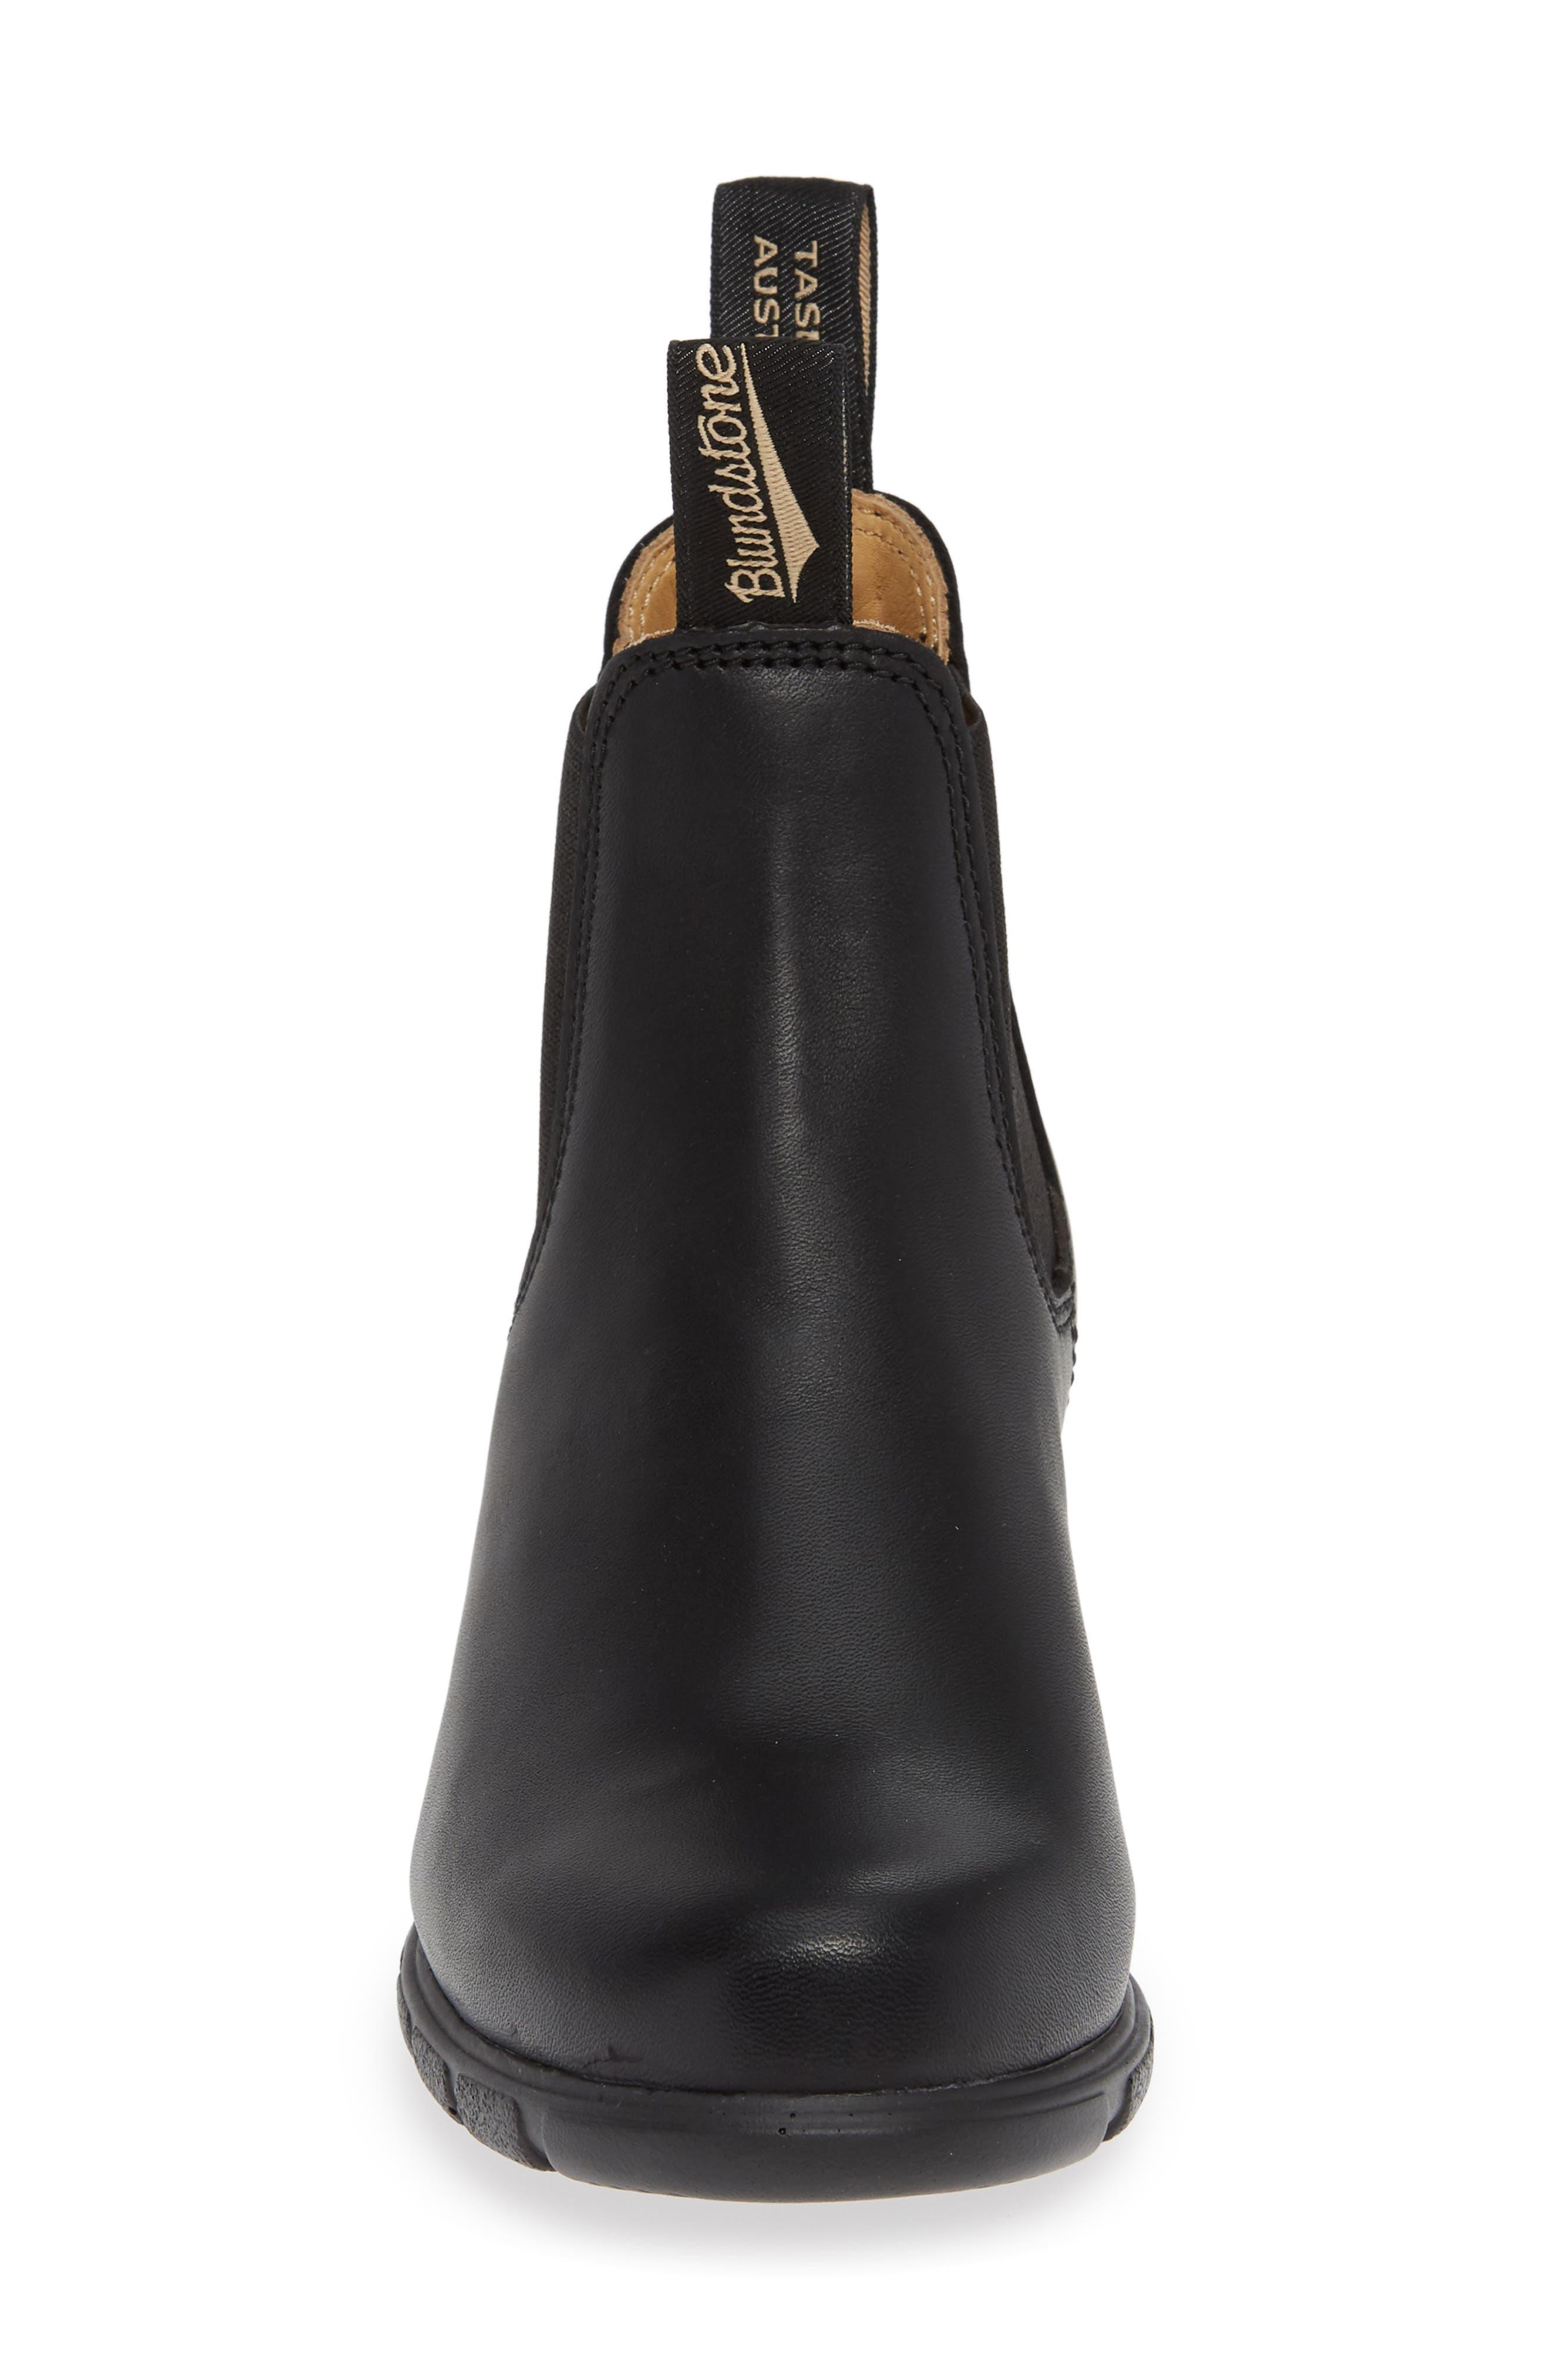 1671 Chelsea Boot,                             Alternate thumbnail 4, color,                             BLACK LEATHER